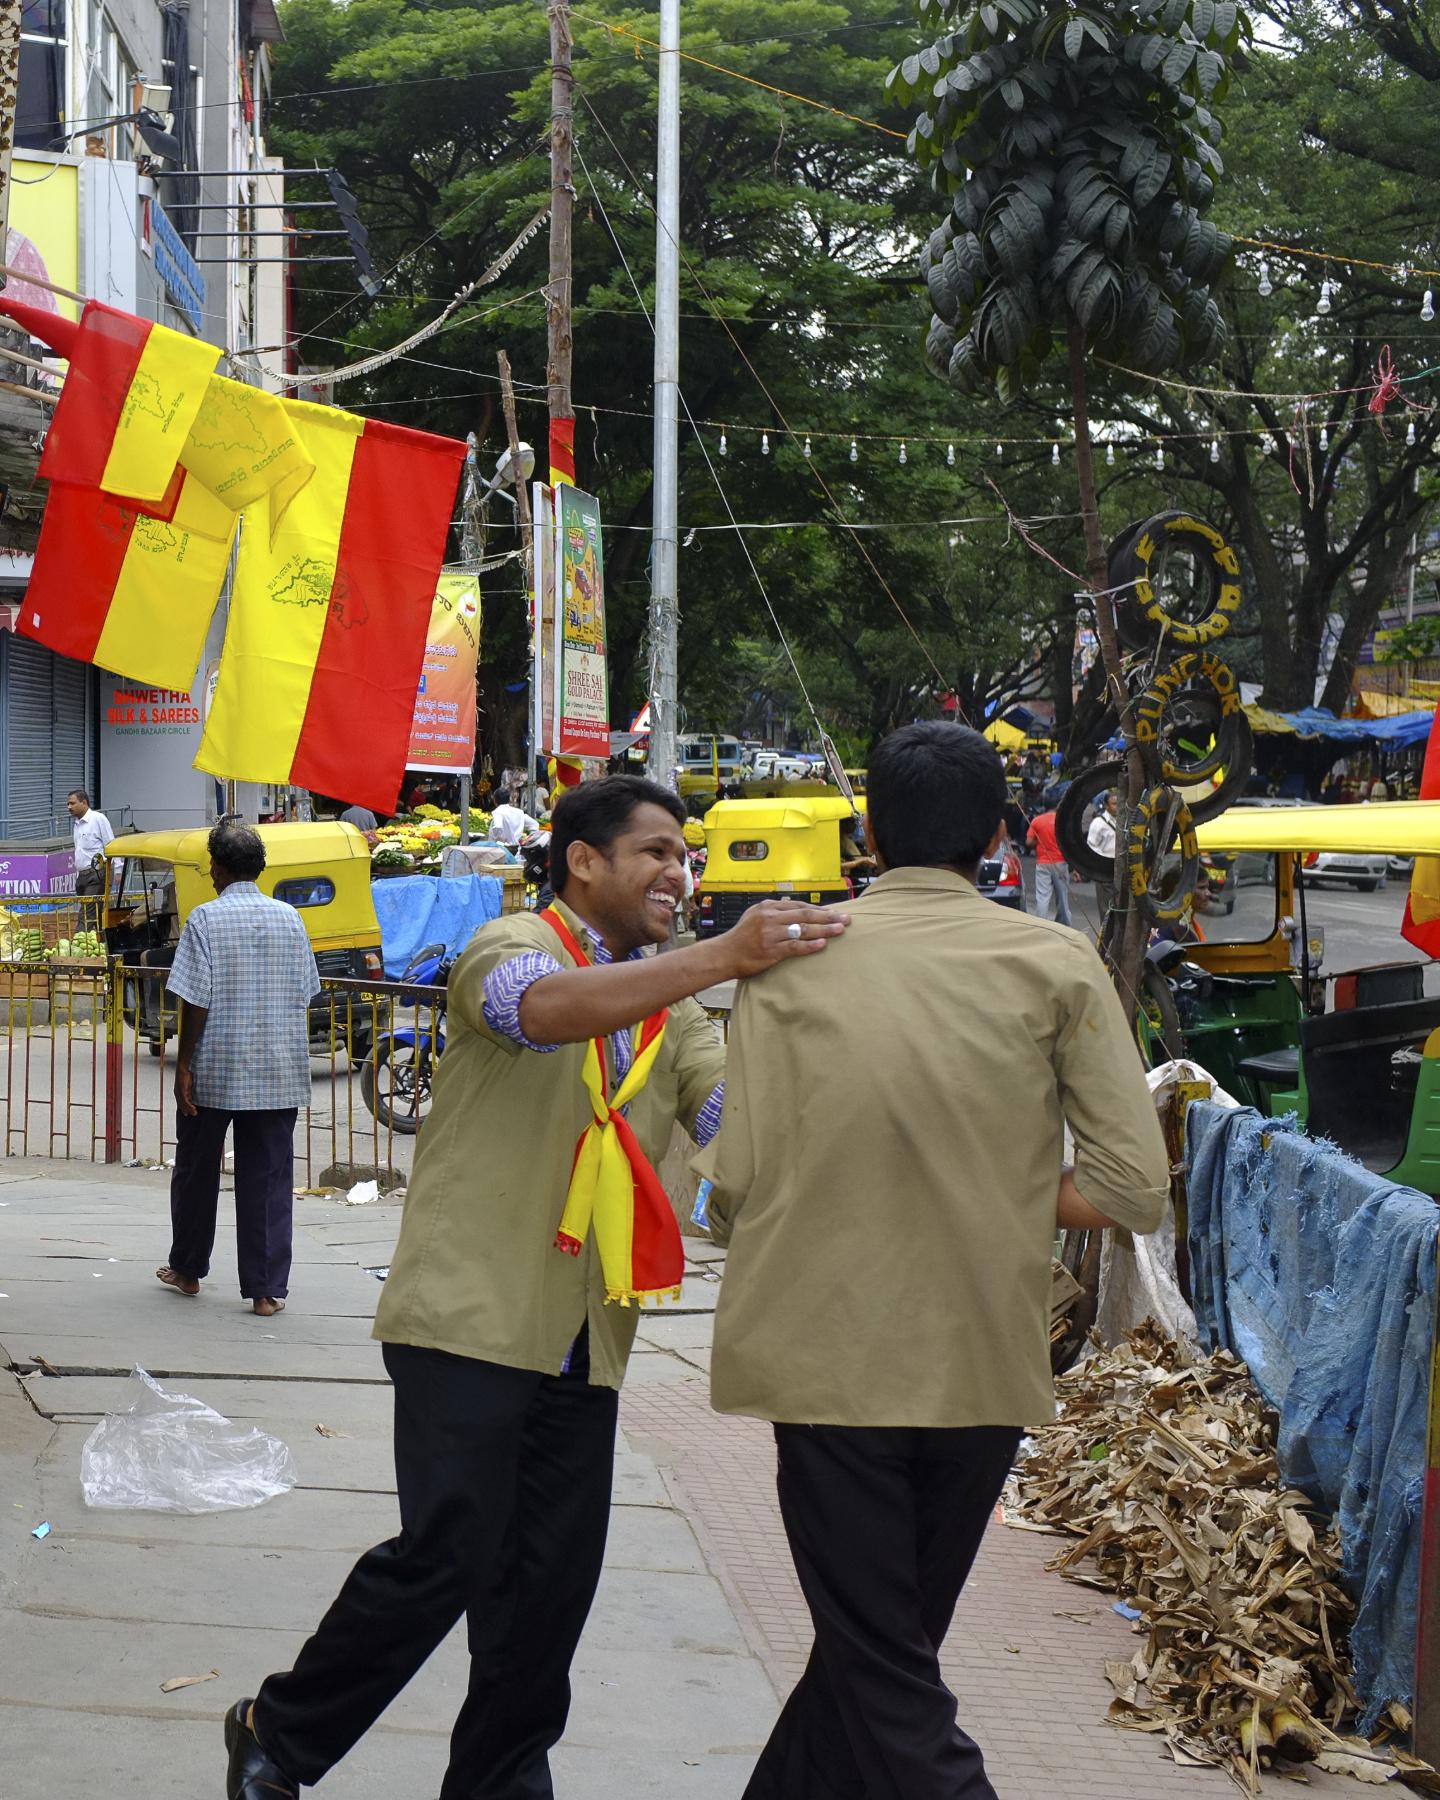 Auto drivers in a joyous  mood on Kaannaa Rajyotsava  Day